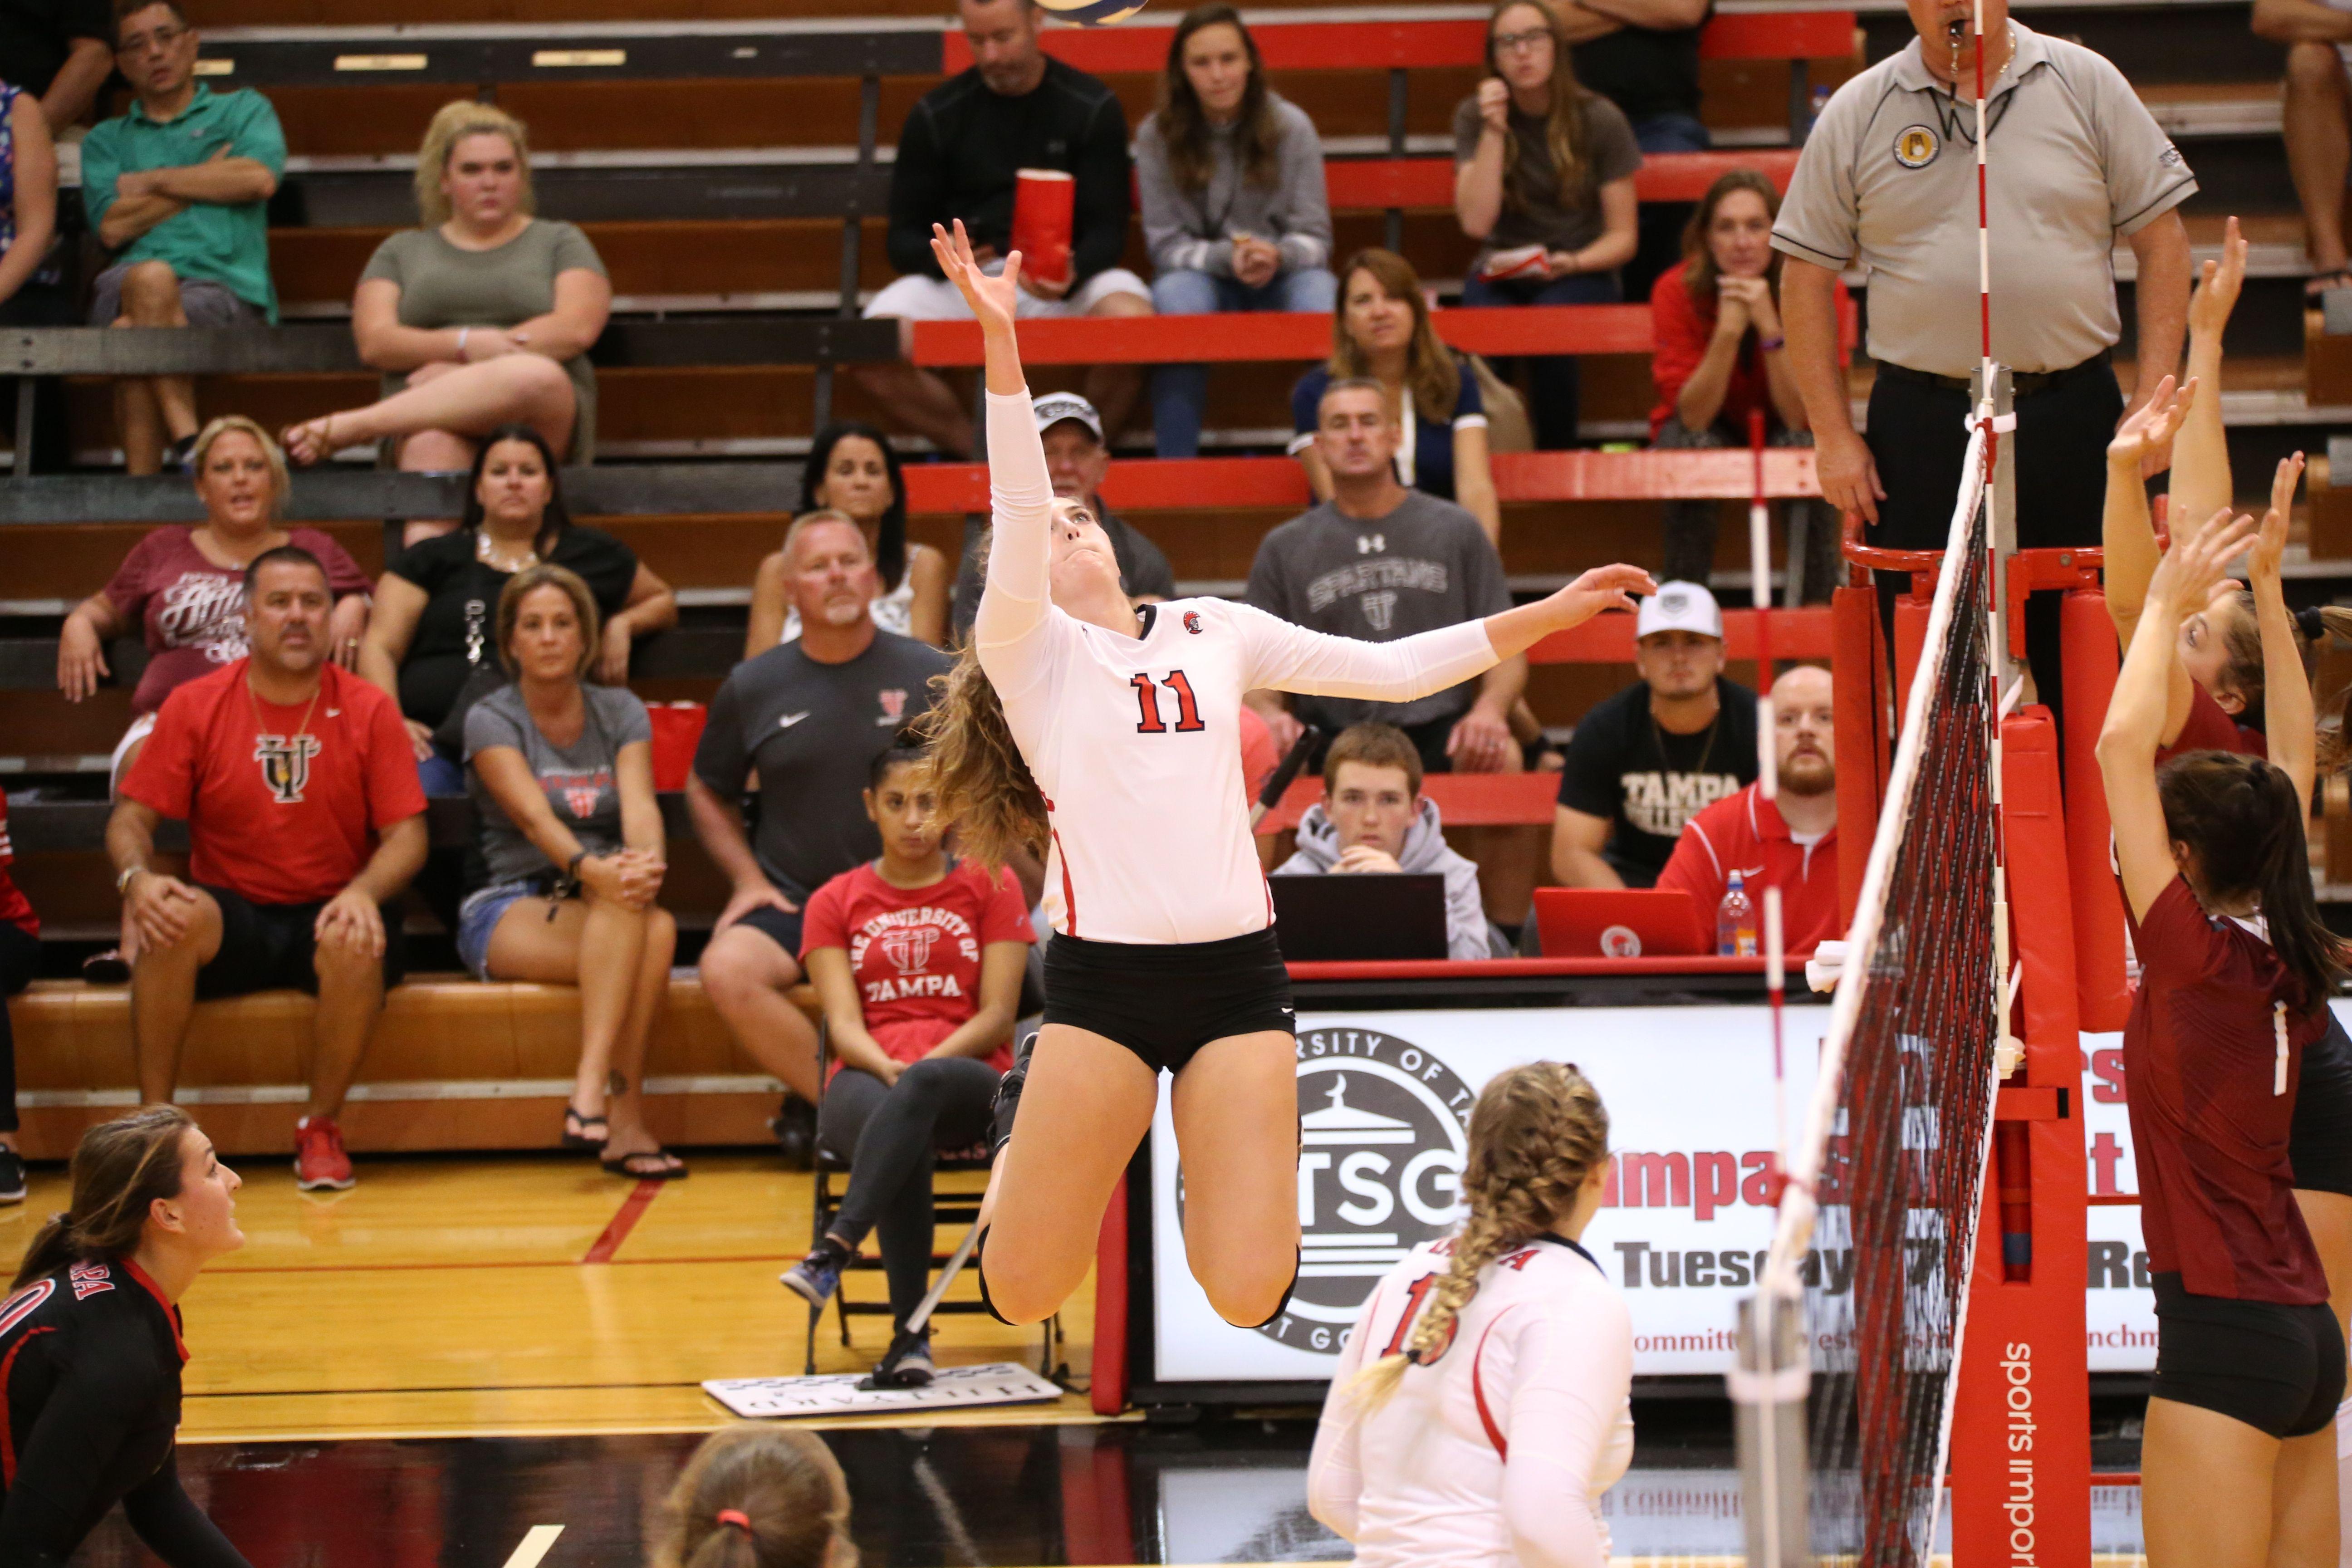 University Of Tampa Women S Volleyball Women Volleyball University Of Tampa Volleyball